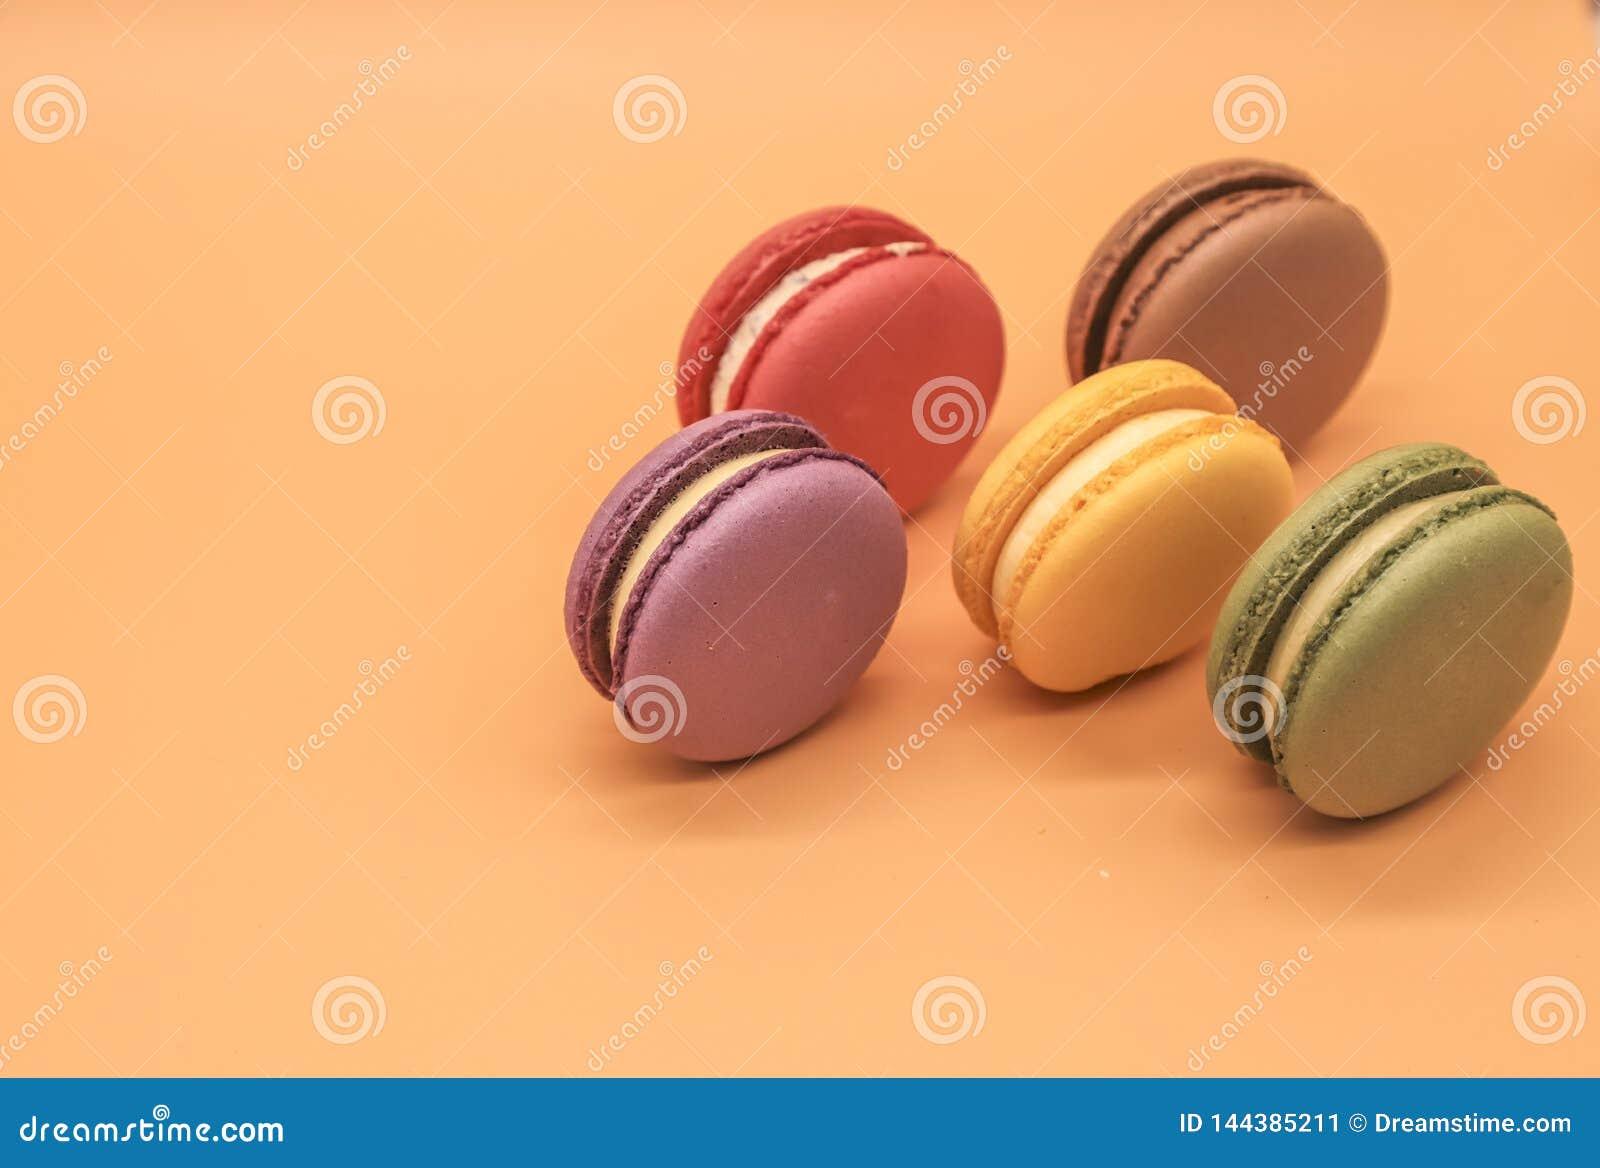 Colorful macaroons cakes on orange background